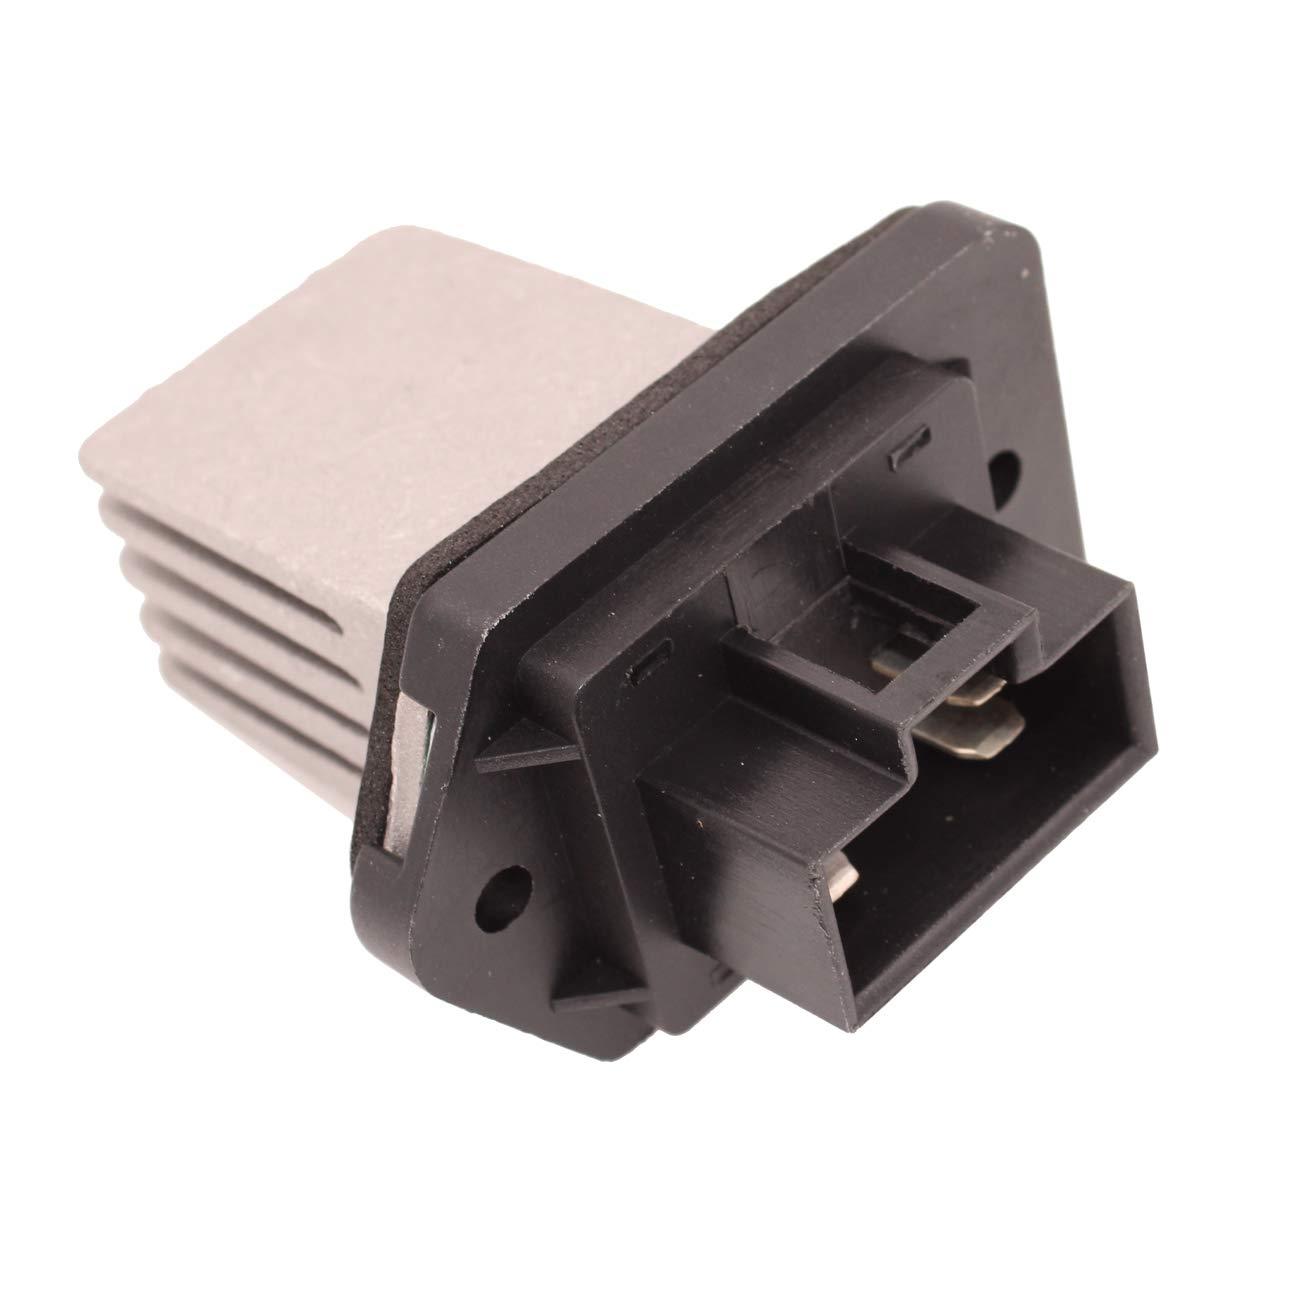 HZYCKJ/Potenza del resistore del motore del ventilatore HVAC OEM # 9030377 96207453 96327381